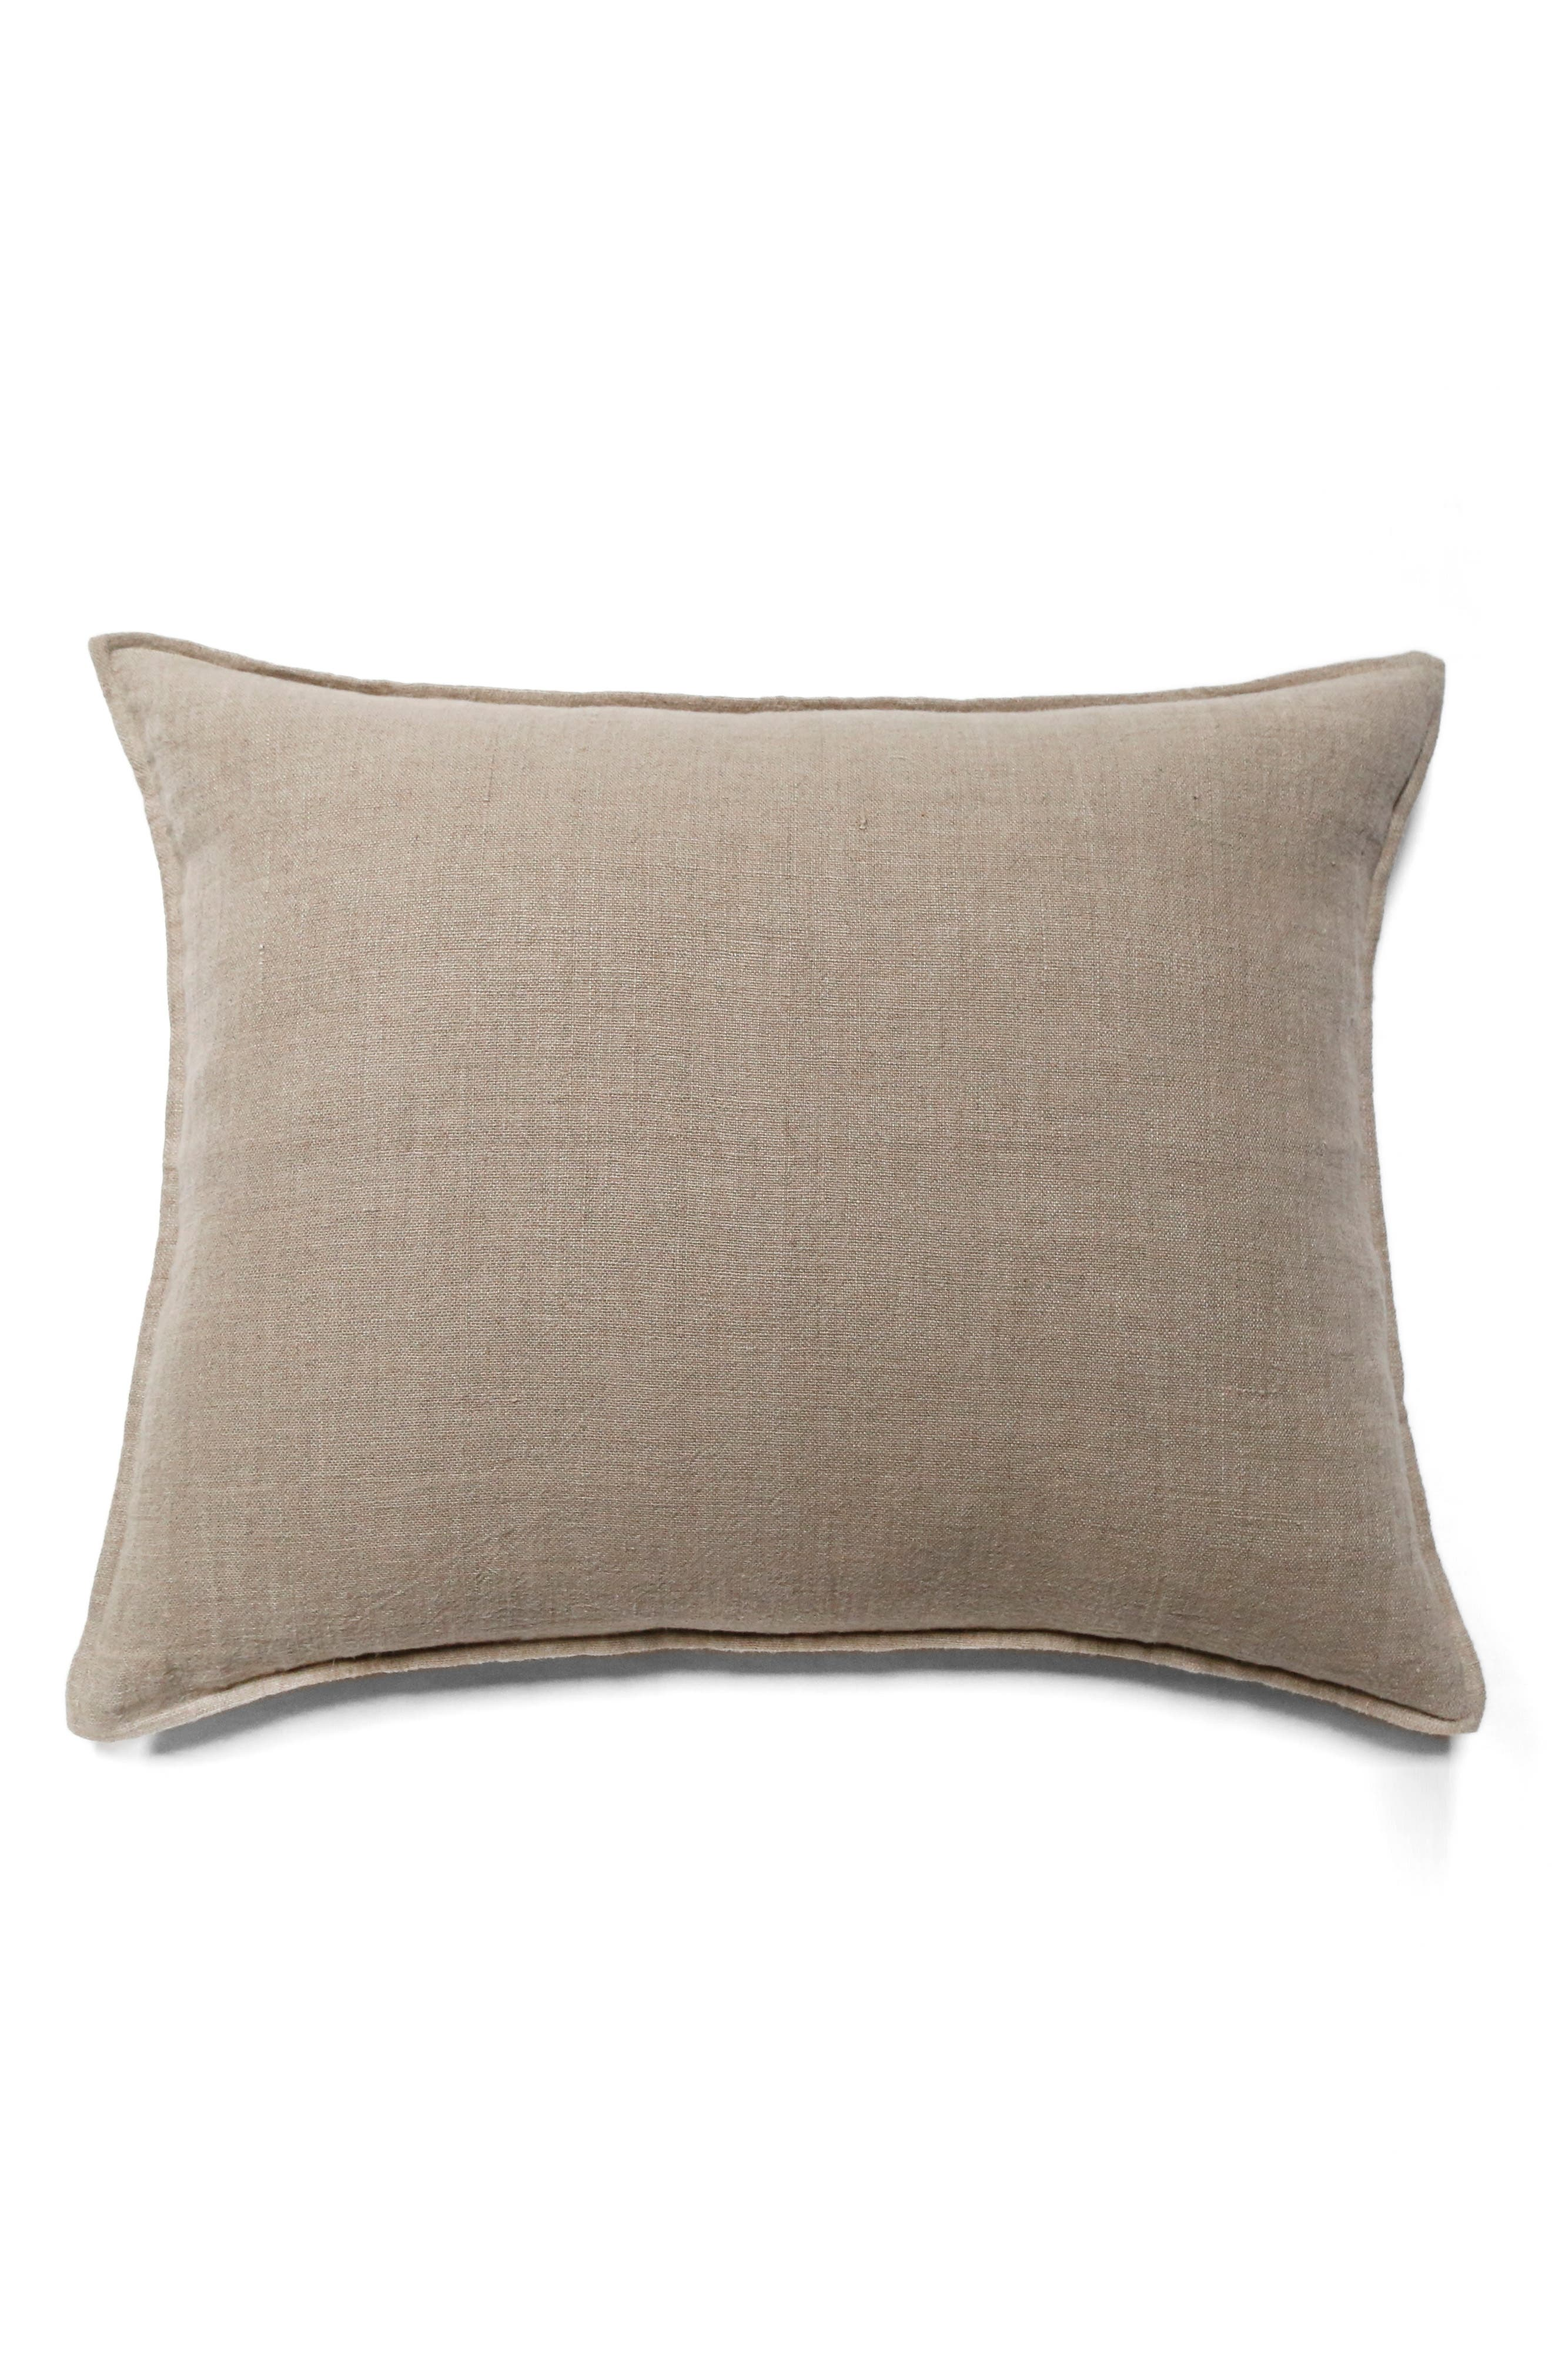 Montauk Big Accent Pillow,                         Main,                         color, Brown